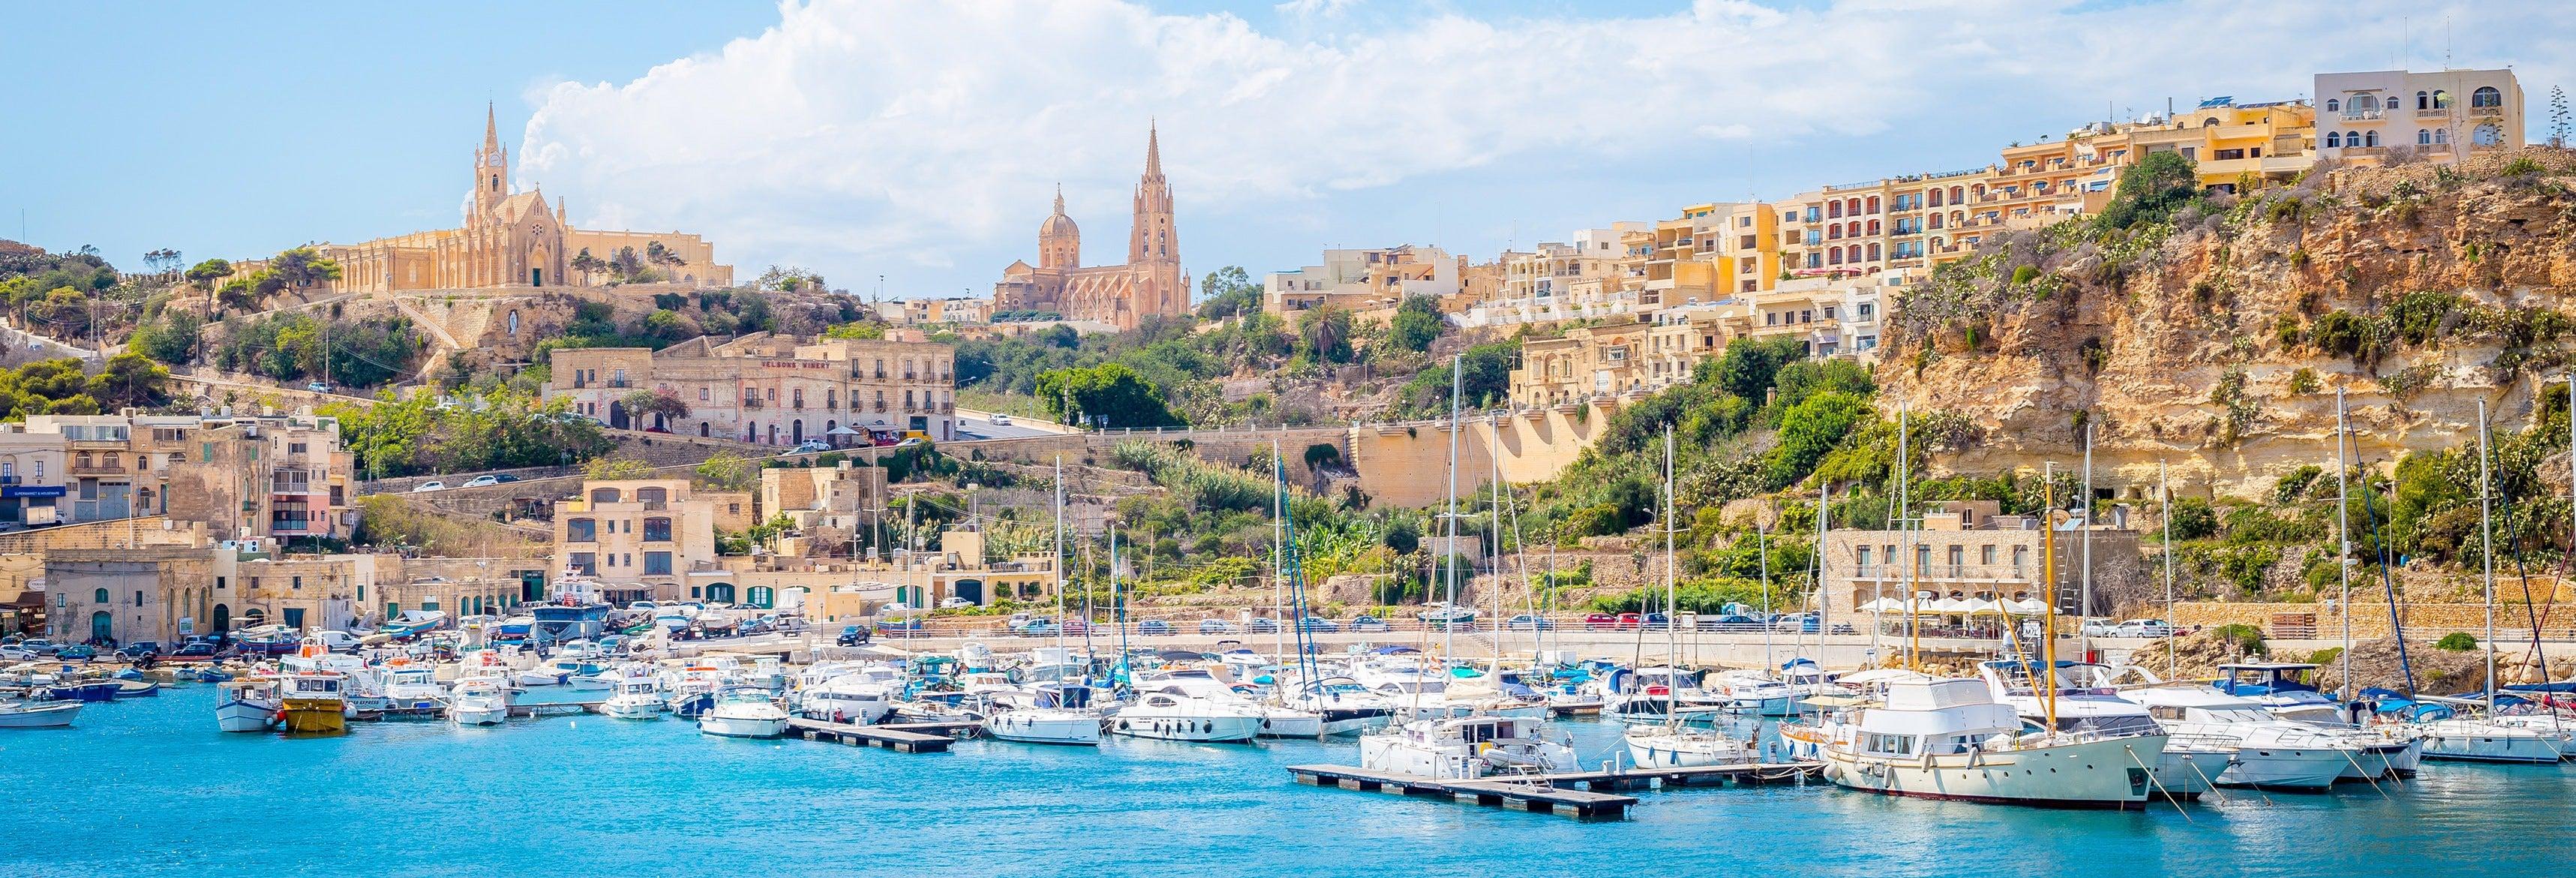 Excursão a Gozo